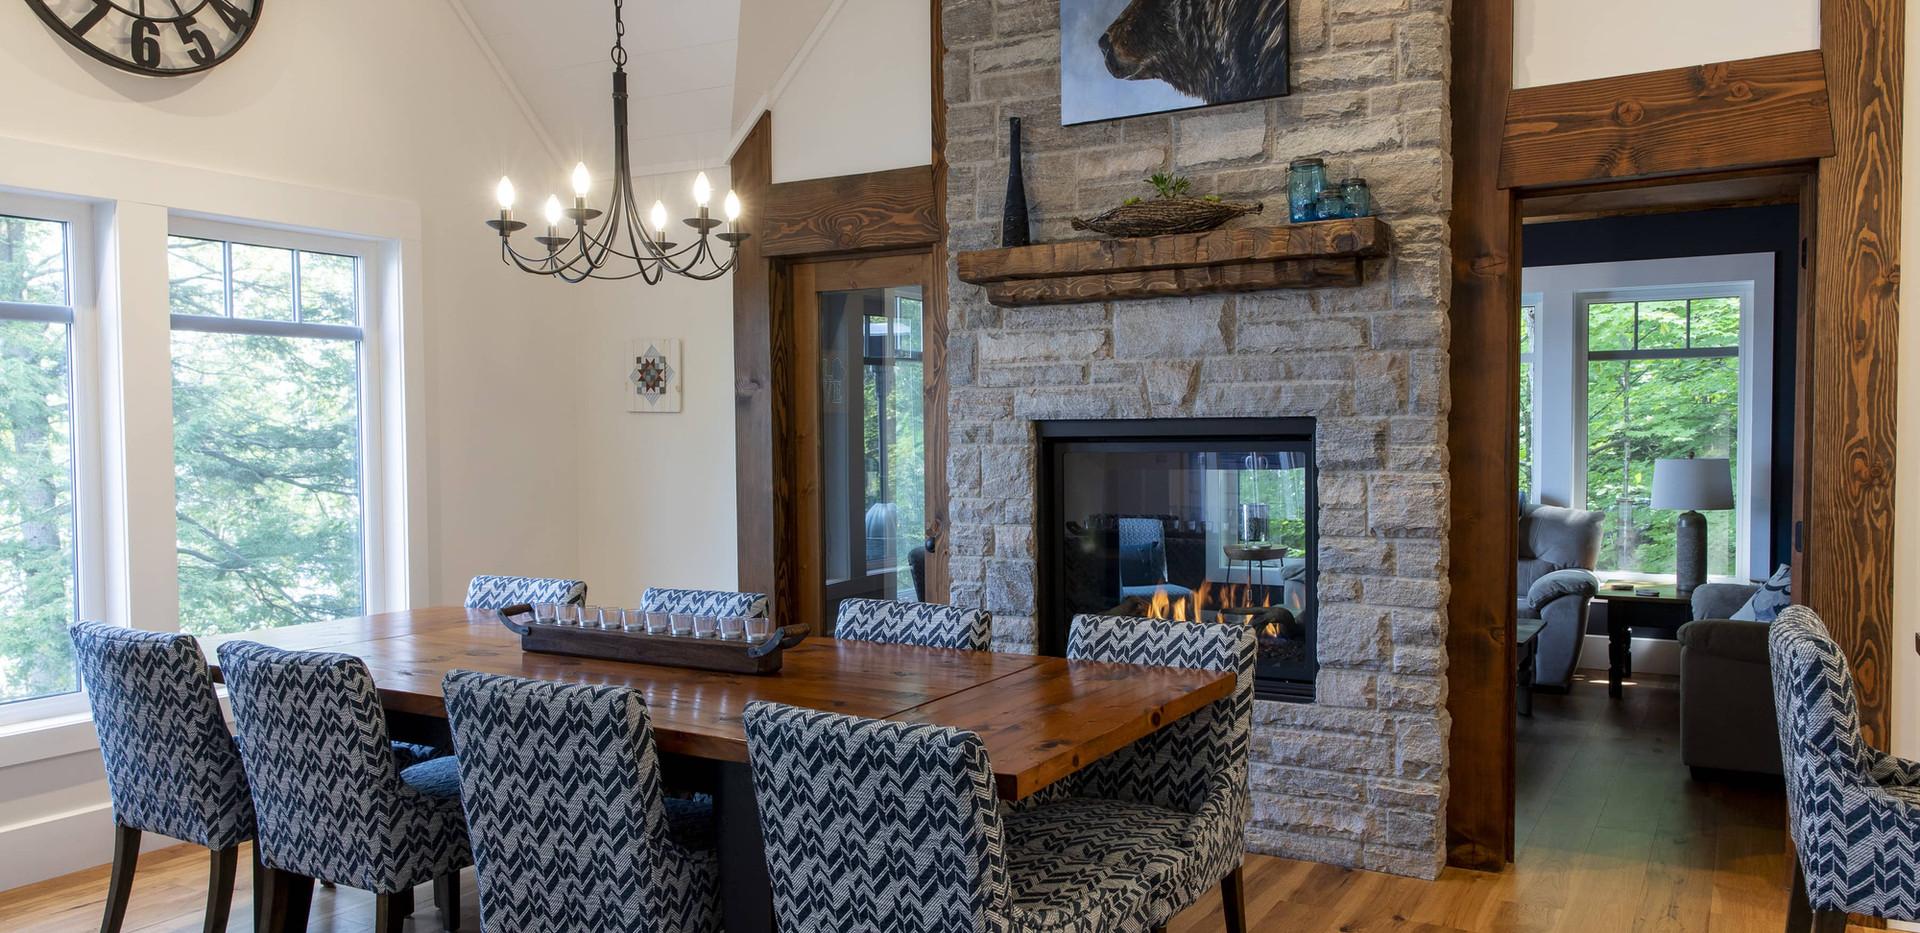 Floor to Ceiling Fireplace in Dining Room Custom Edenlane Muskoka